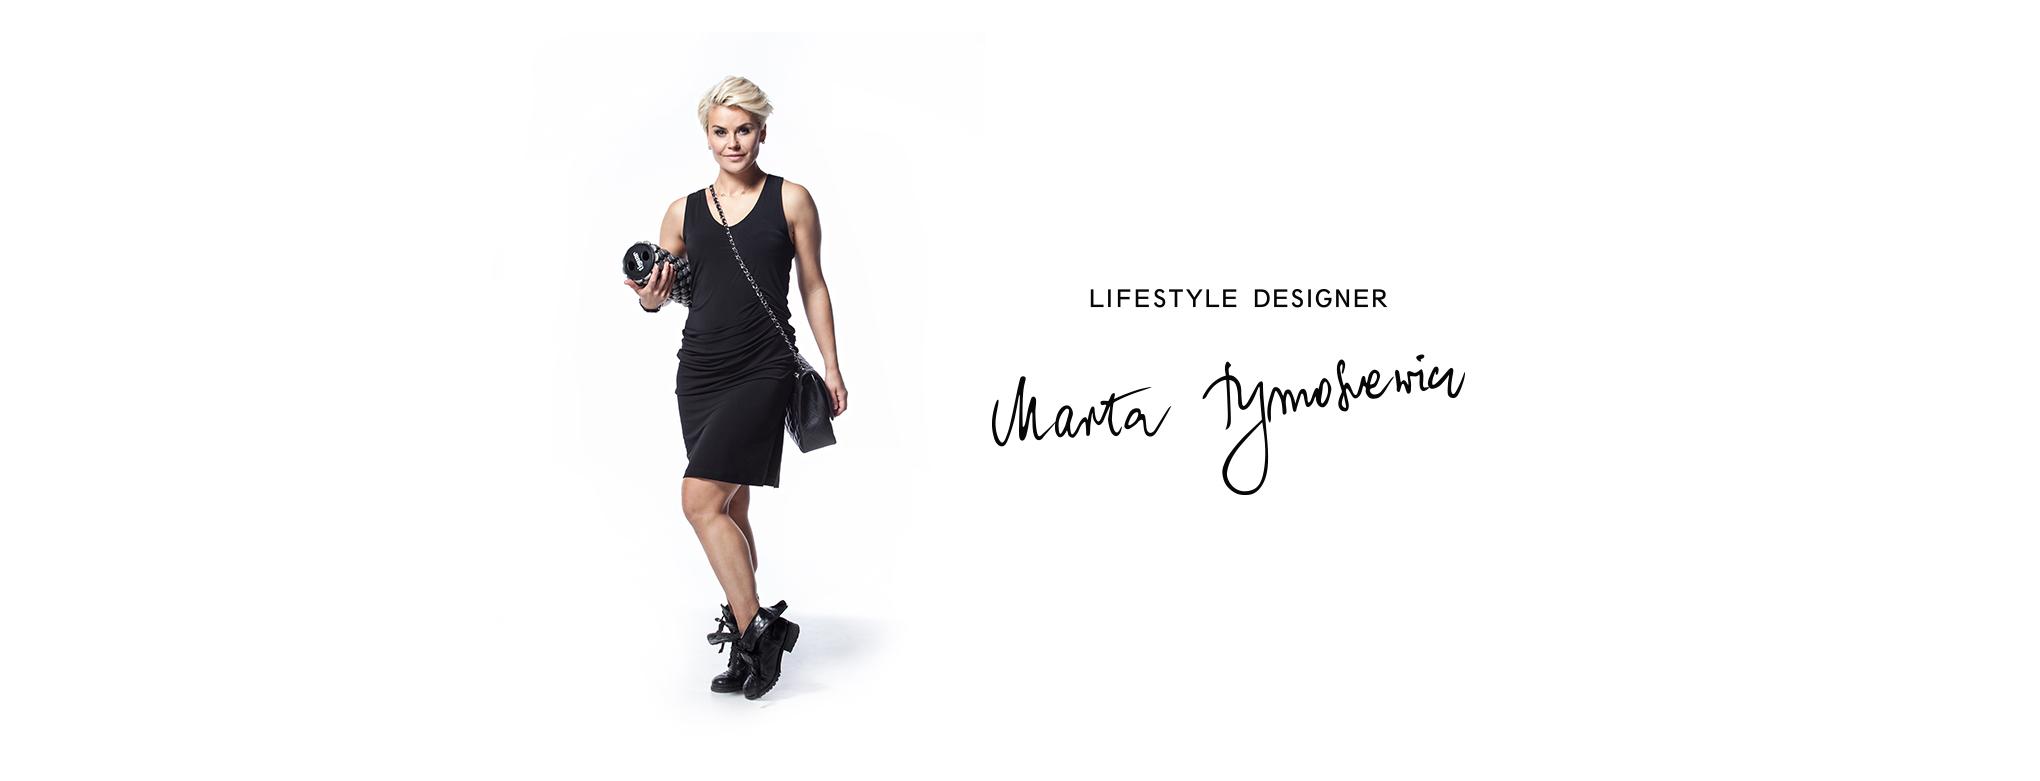 Marta_lifestyle_designer